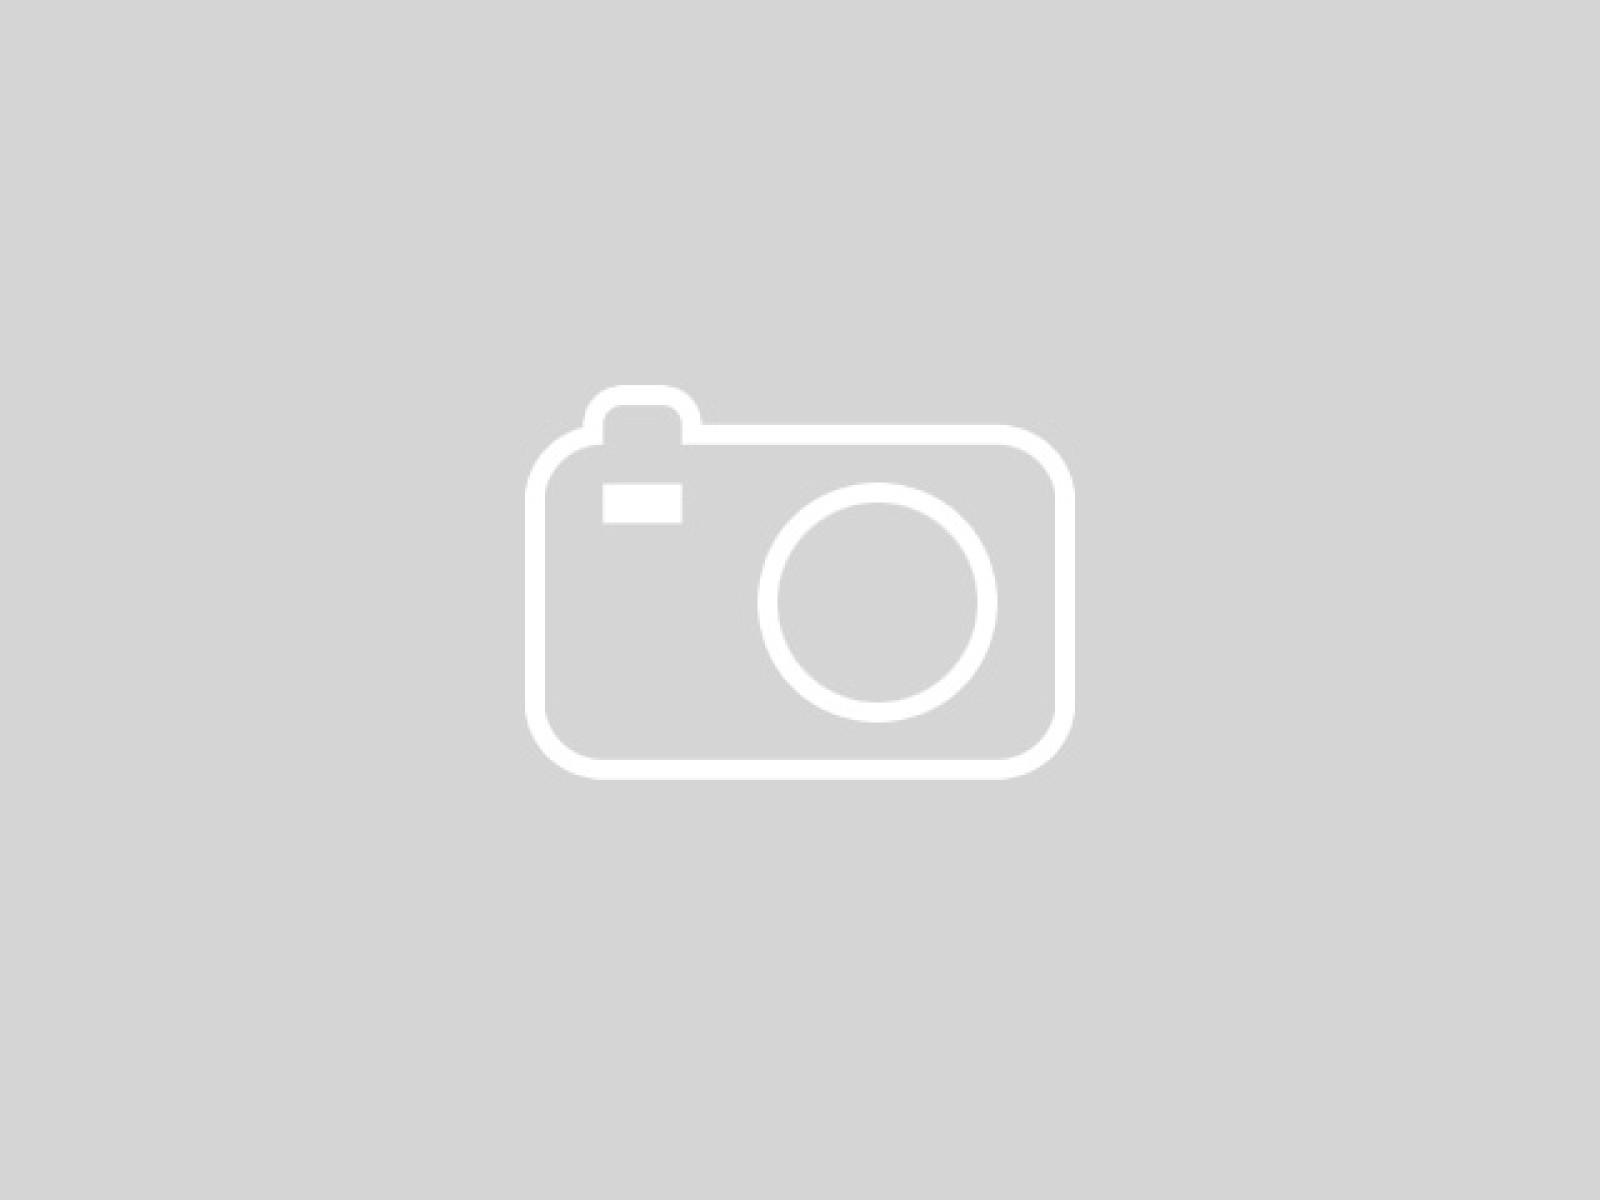 New 2020 Audi A3 Sedan Premium